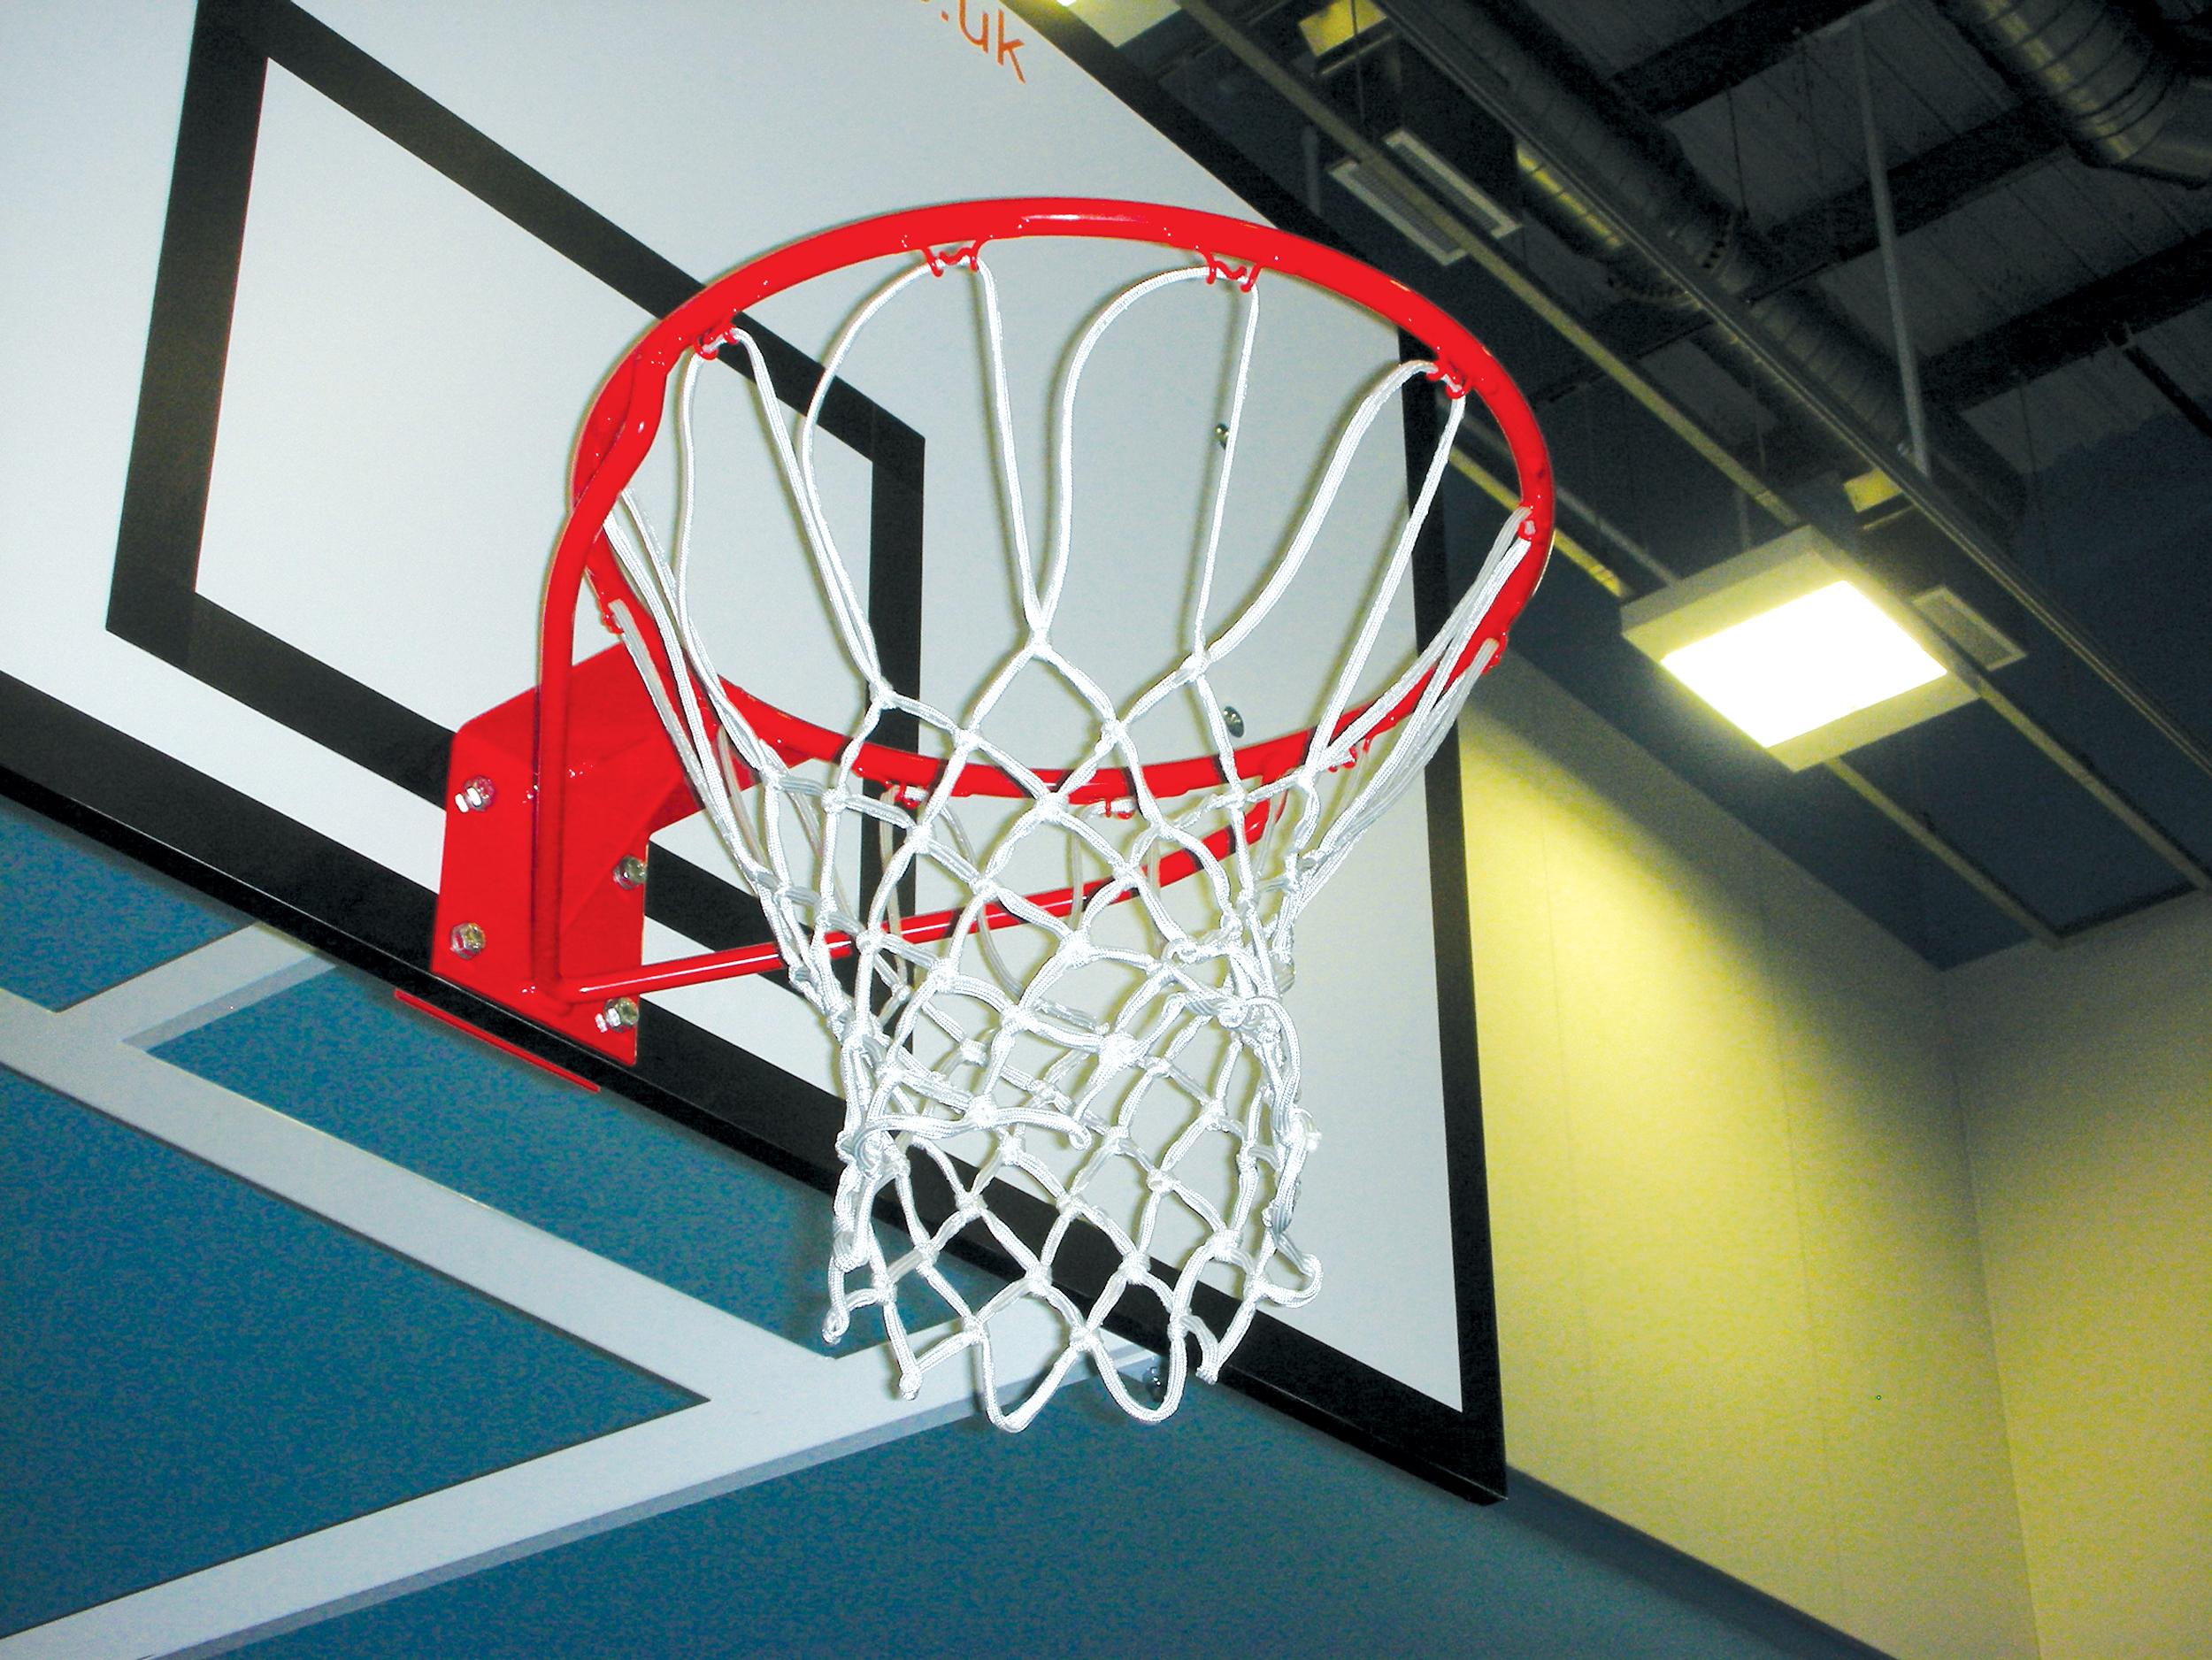 Solid Basketball Rings - Heavy Duty Goal